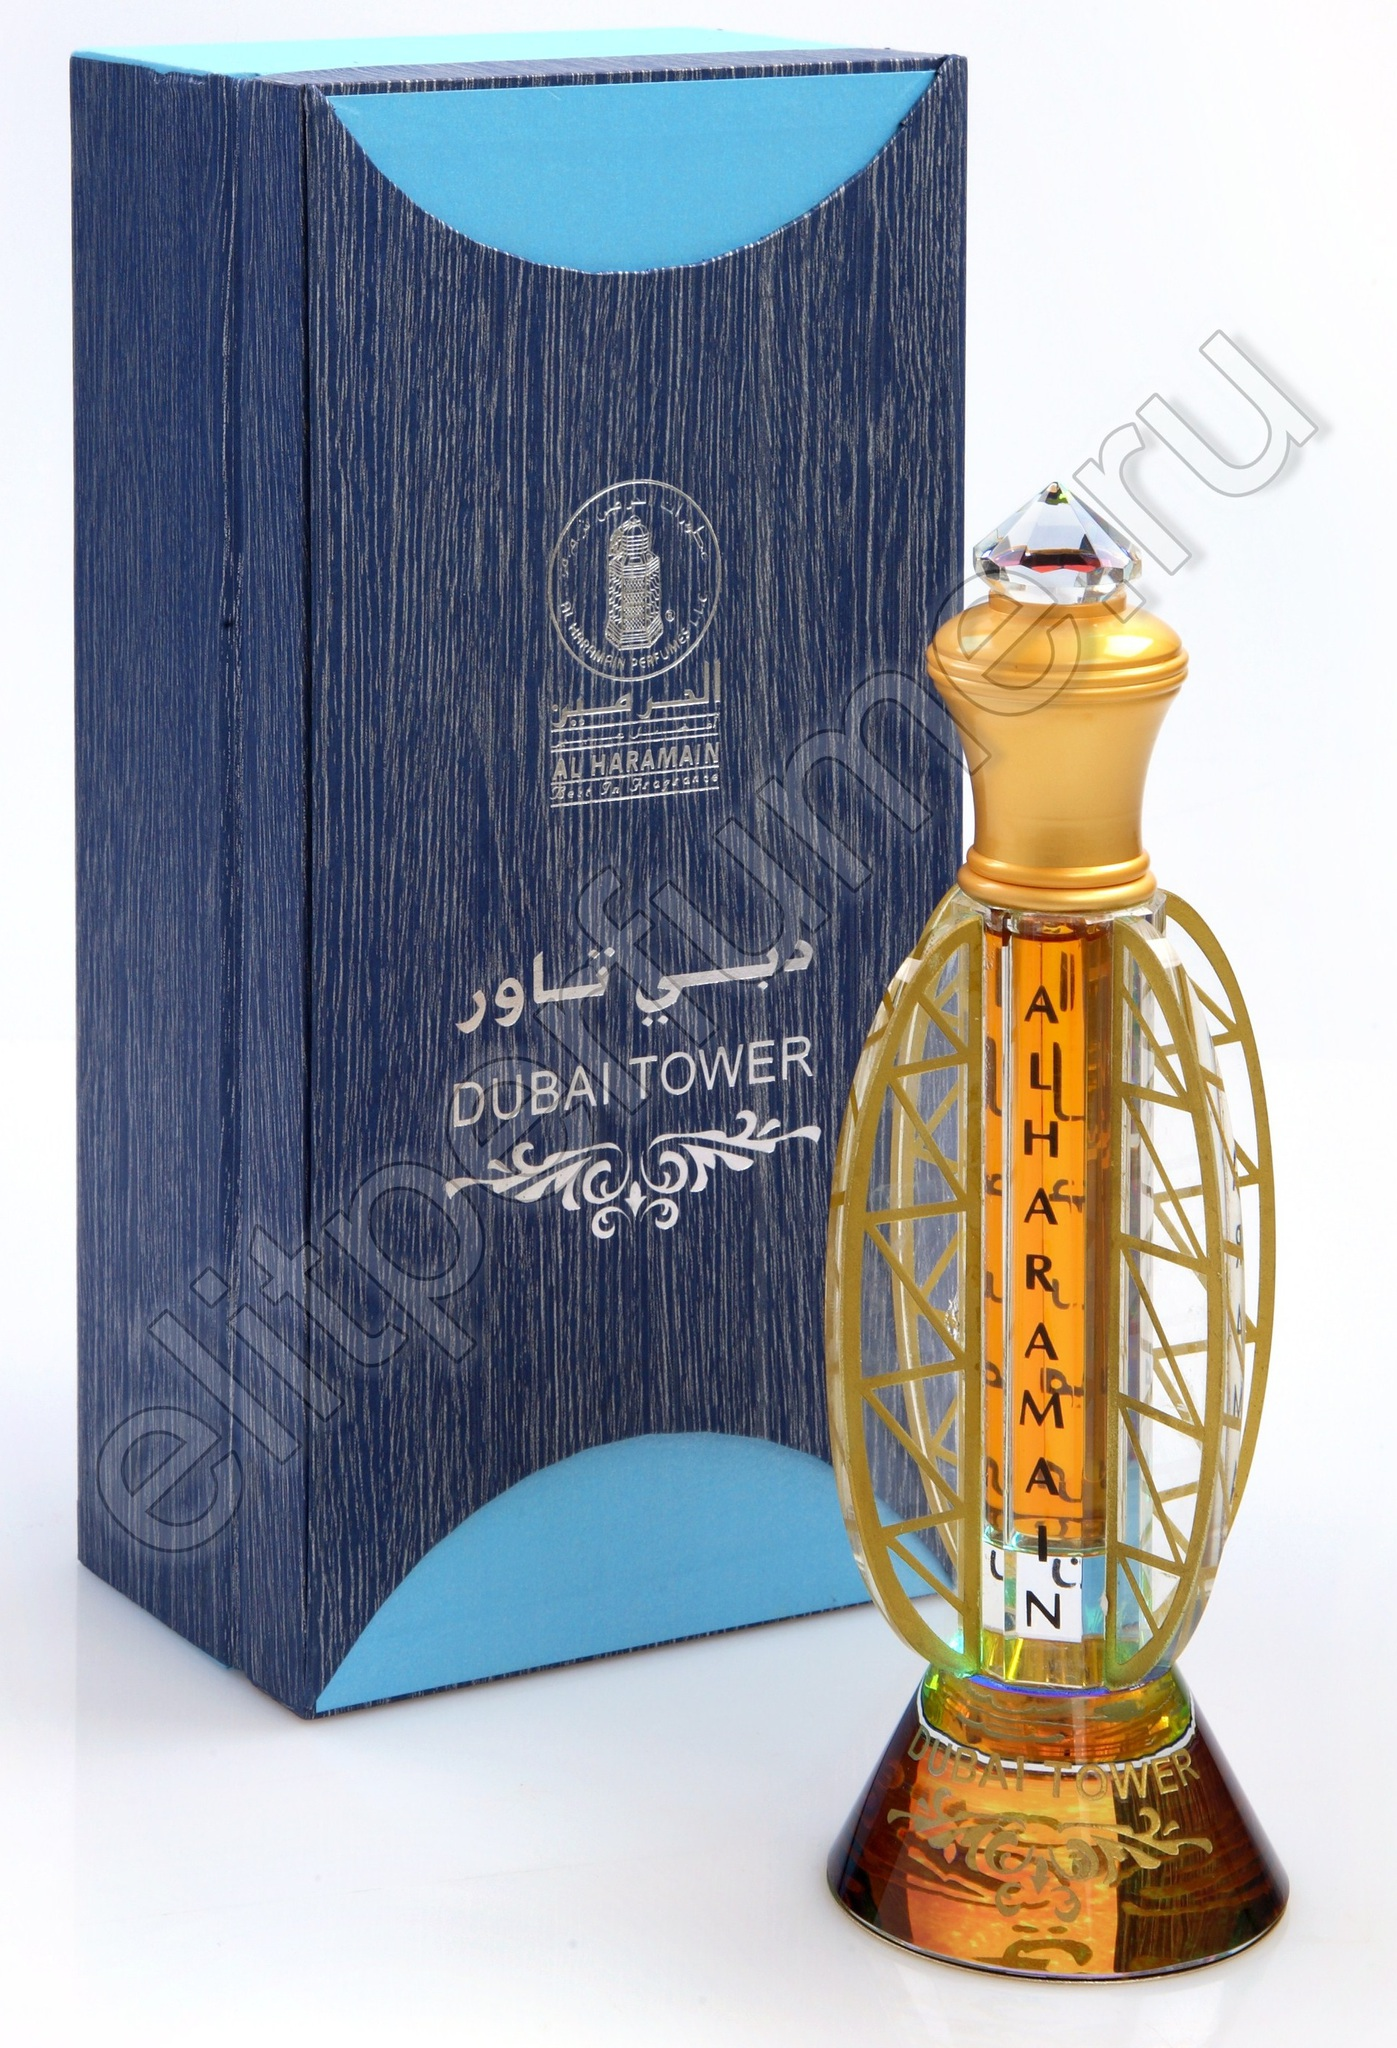 Башня Дубая / Dubai Tower 12 мл арабские масляные духи от Аль Харамайн Al Haramain Perfumes